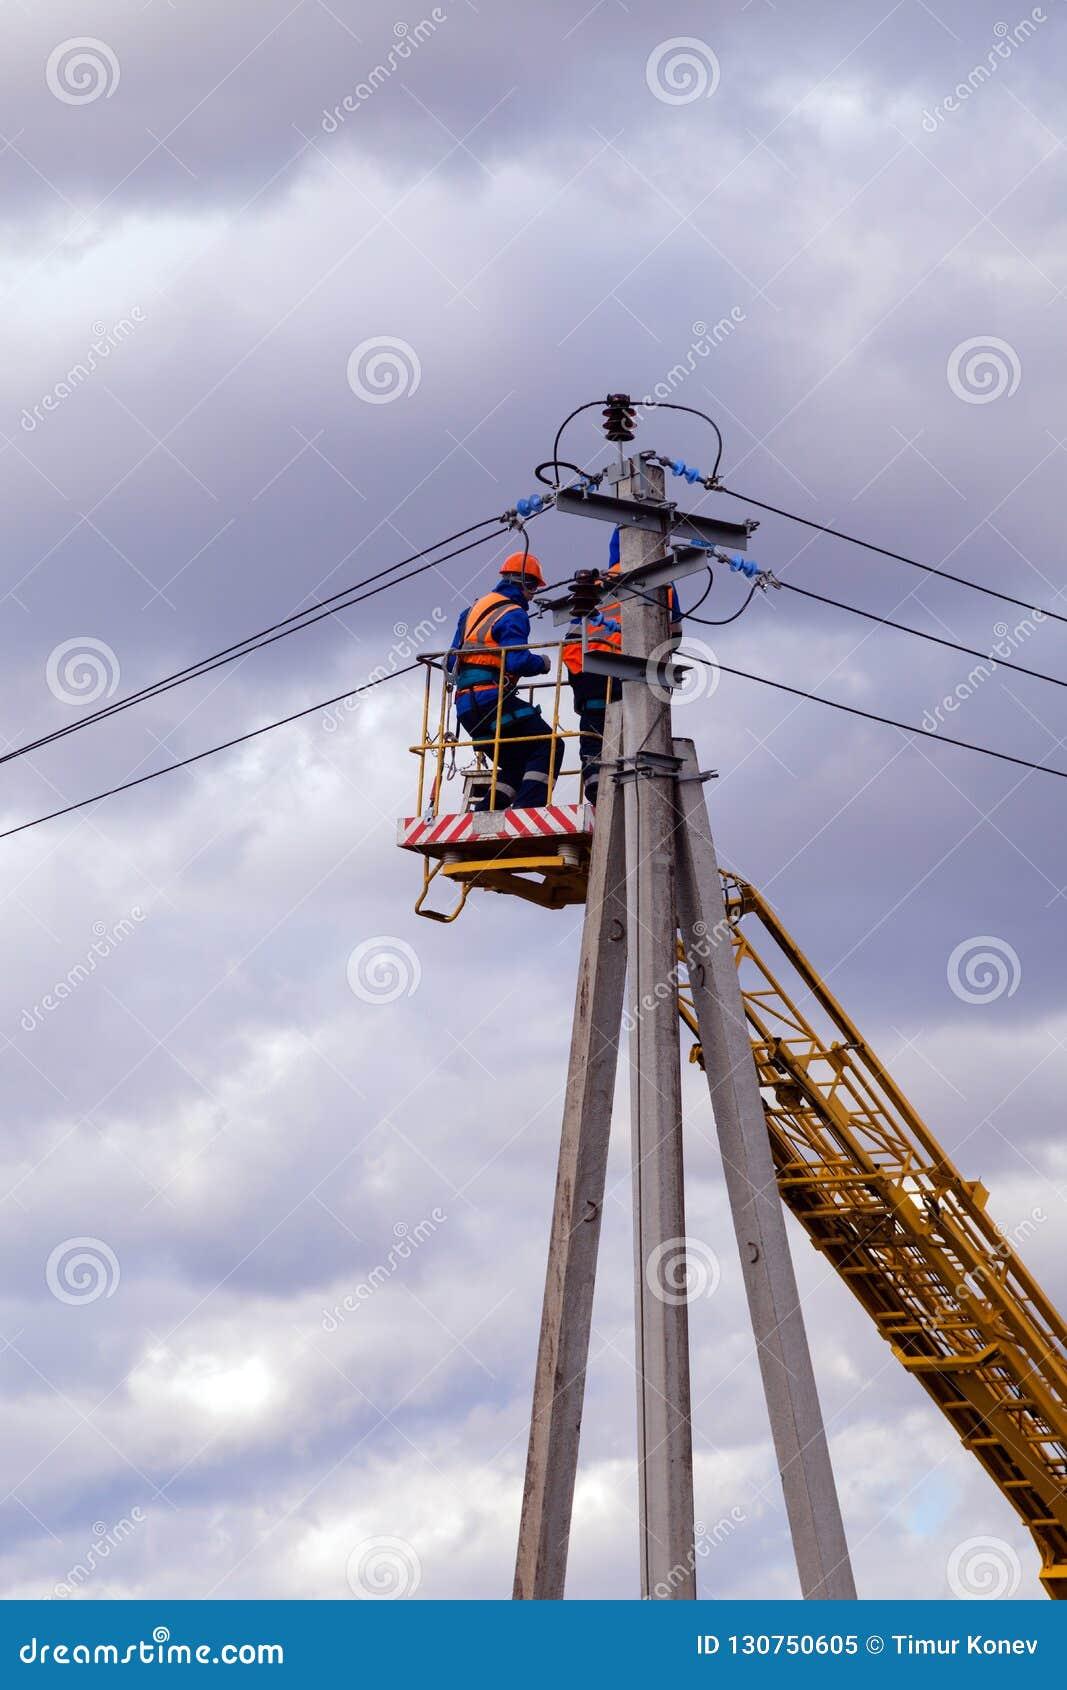 Россия, Kemerovo, команда электриков в шлемах и формах r